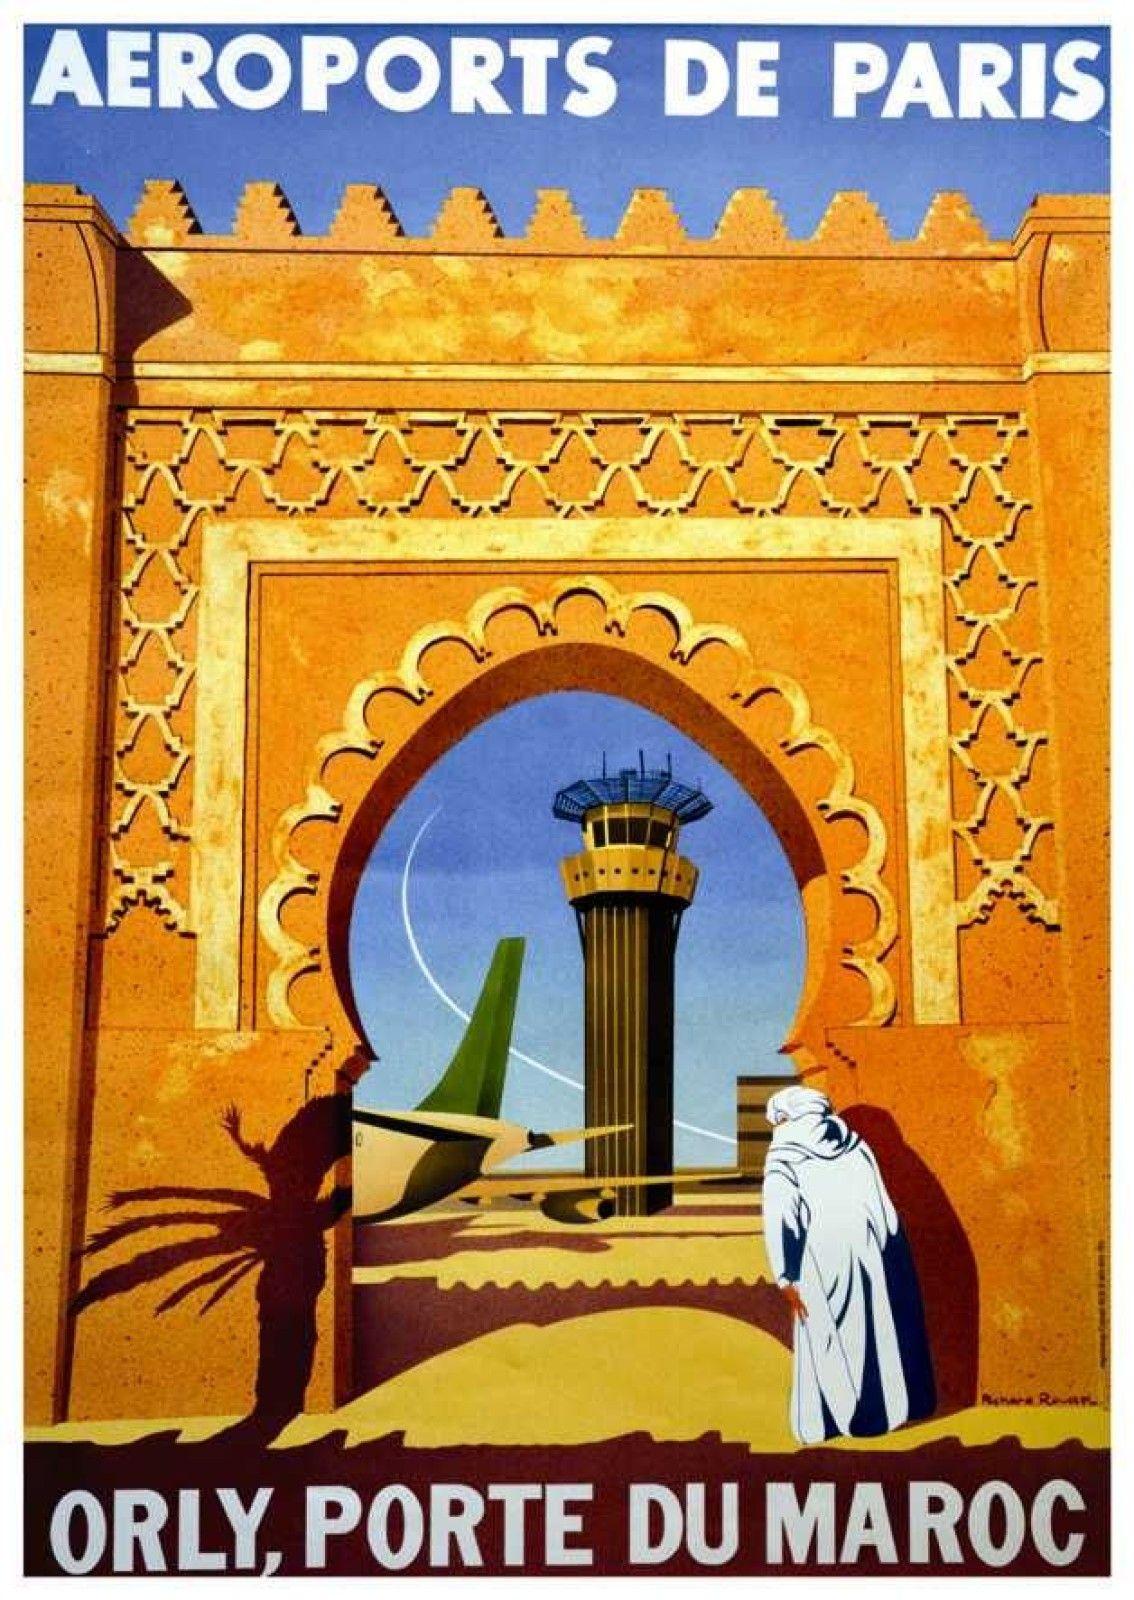 Meknes Ameknas Morocco Bull Horse Tourism Travel Vintage Poster Repro FREE SHIP